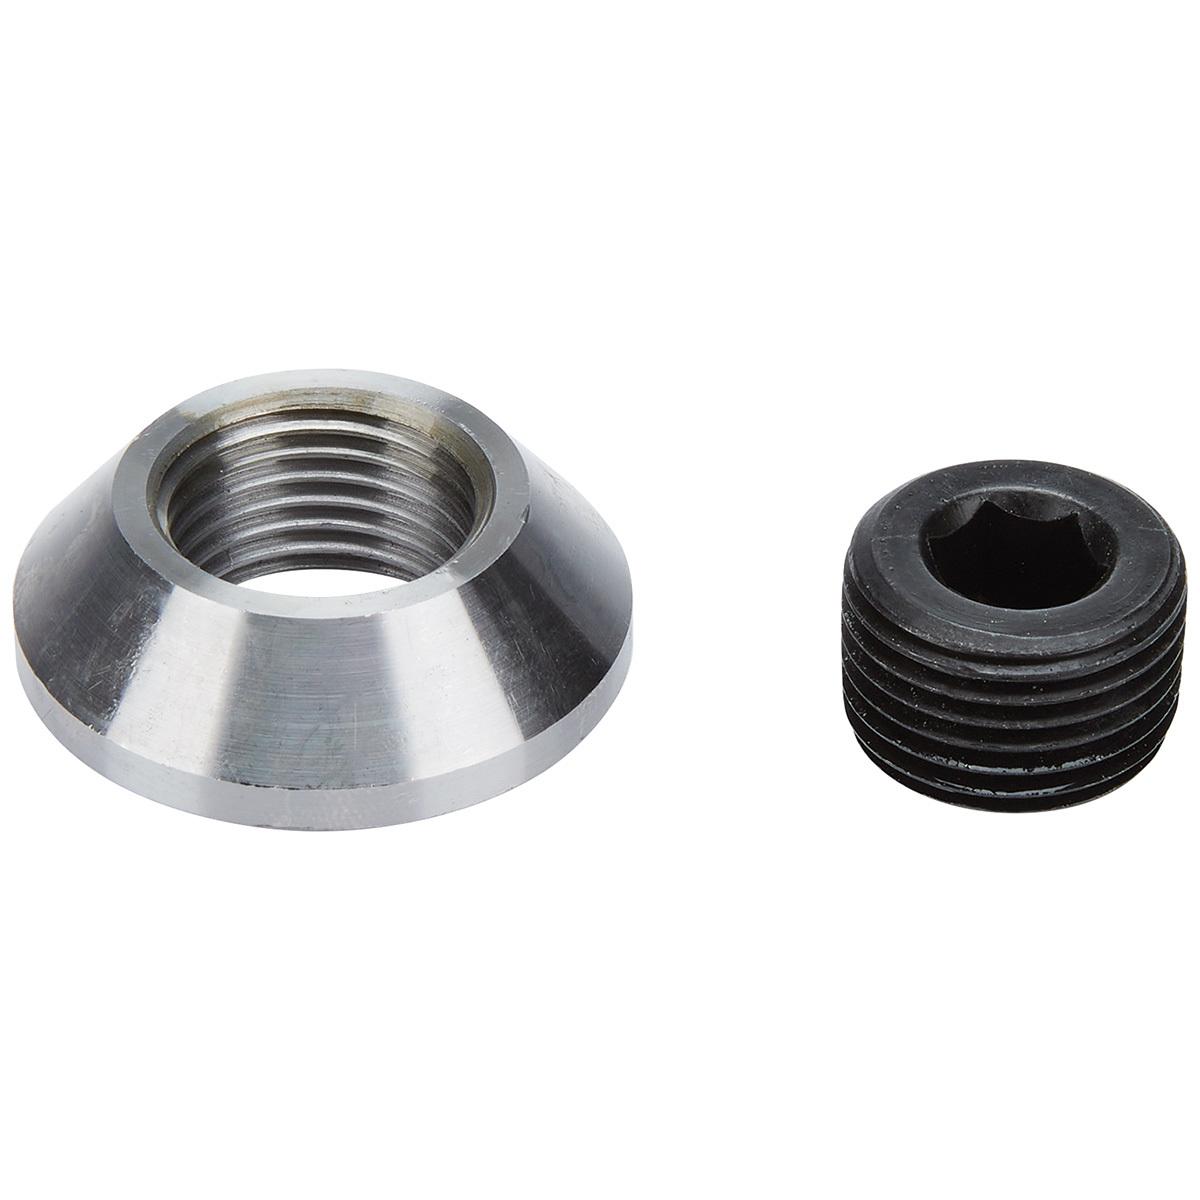 Allstar Performance 50735 Bung and Plug Kit, Weld-On, 1/2 in NPT Plug, Steel, Natural, Kit